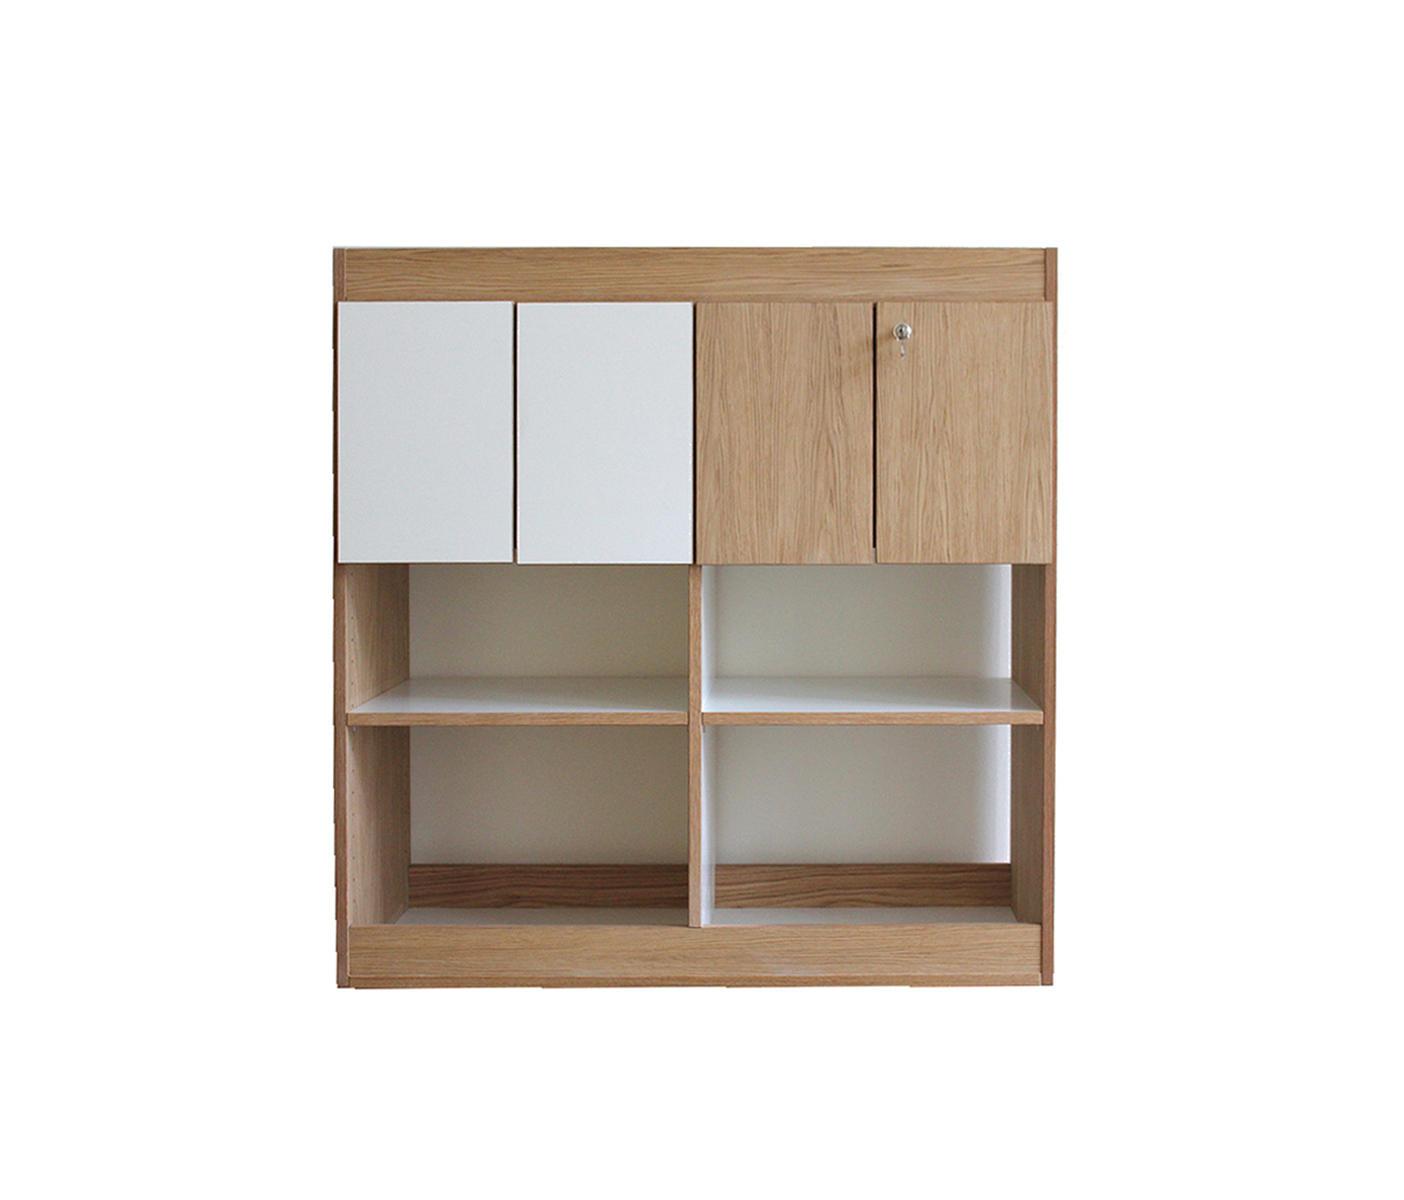 emily schrank 42 schr nke von andreas janson architonic. Black Bedroom Furniture Sets. Home Design Ideas